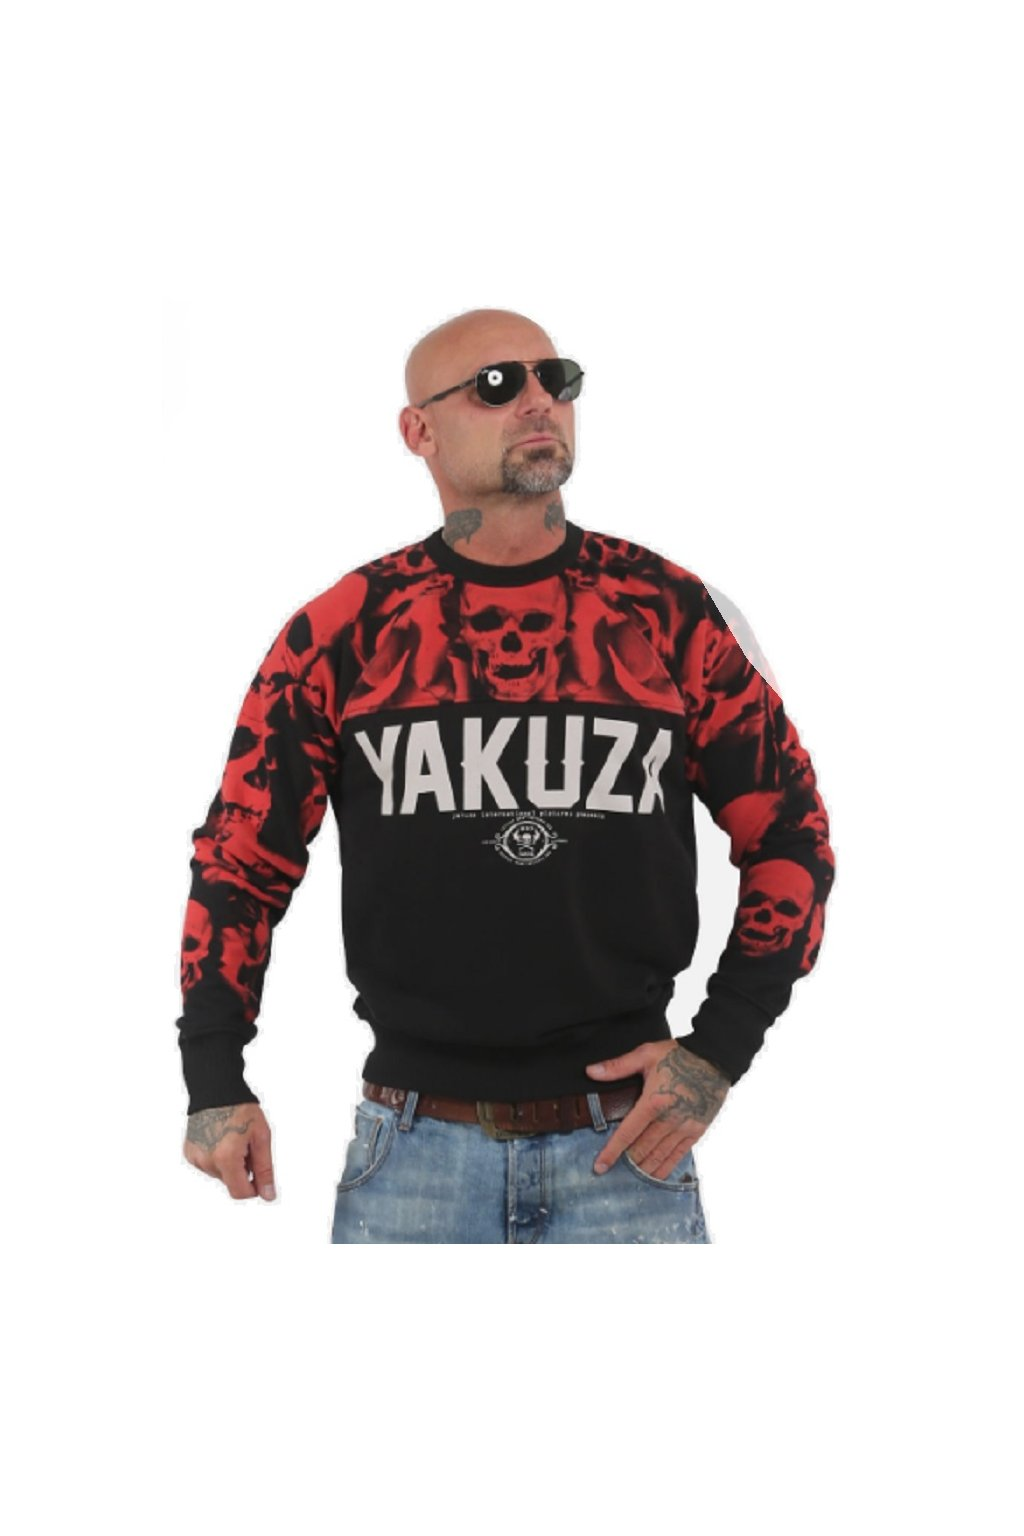 Yakuza mikina pánská Sick N Fxck PB 13052 black obr1